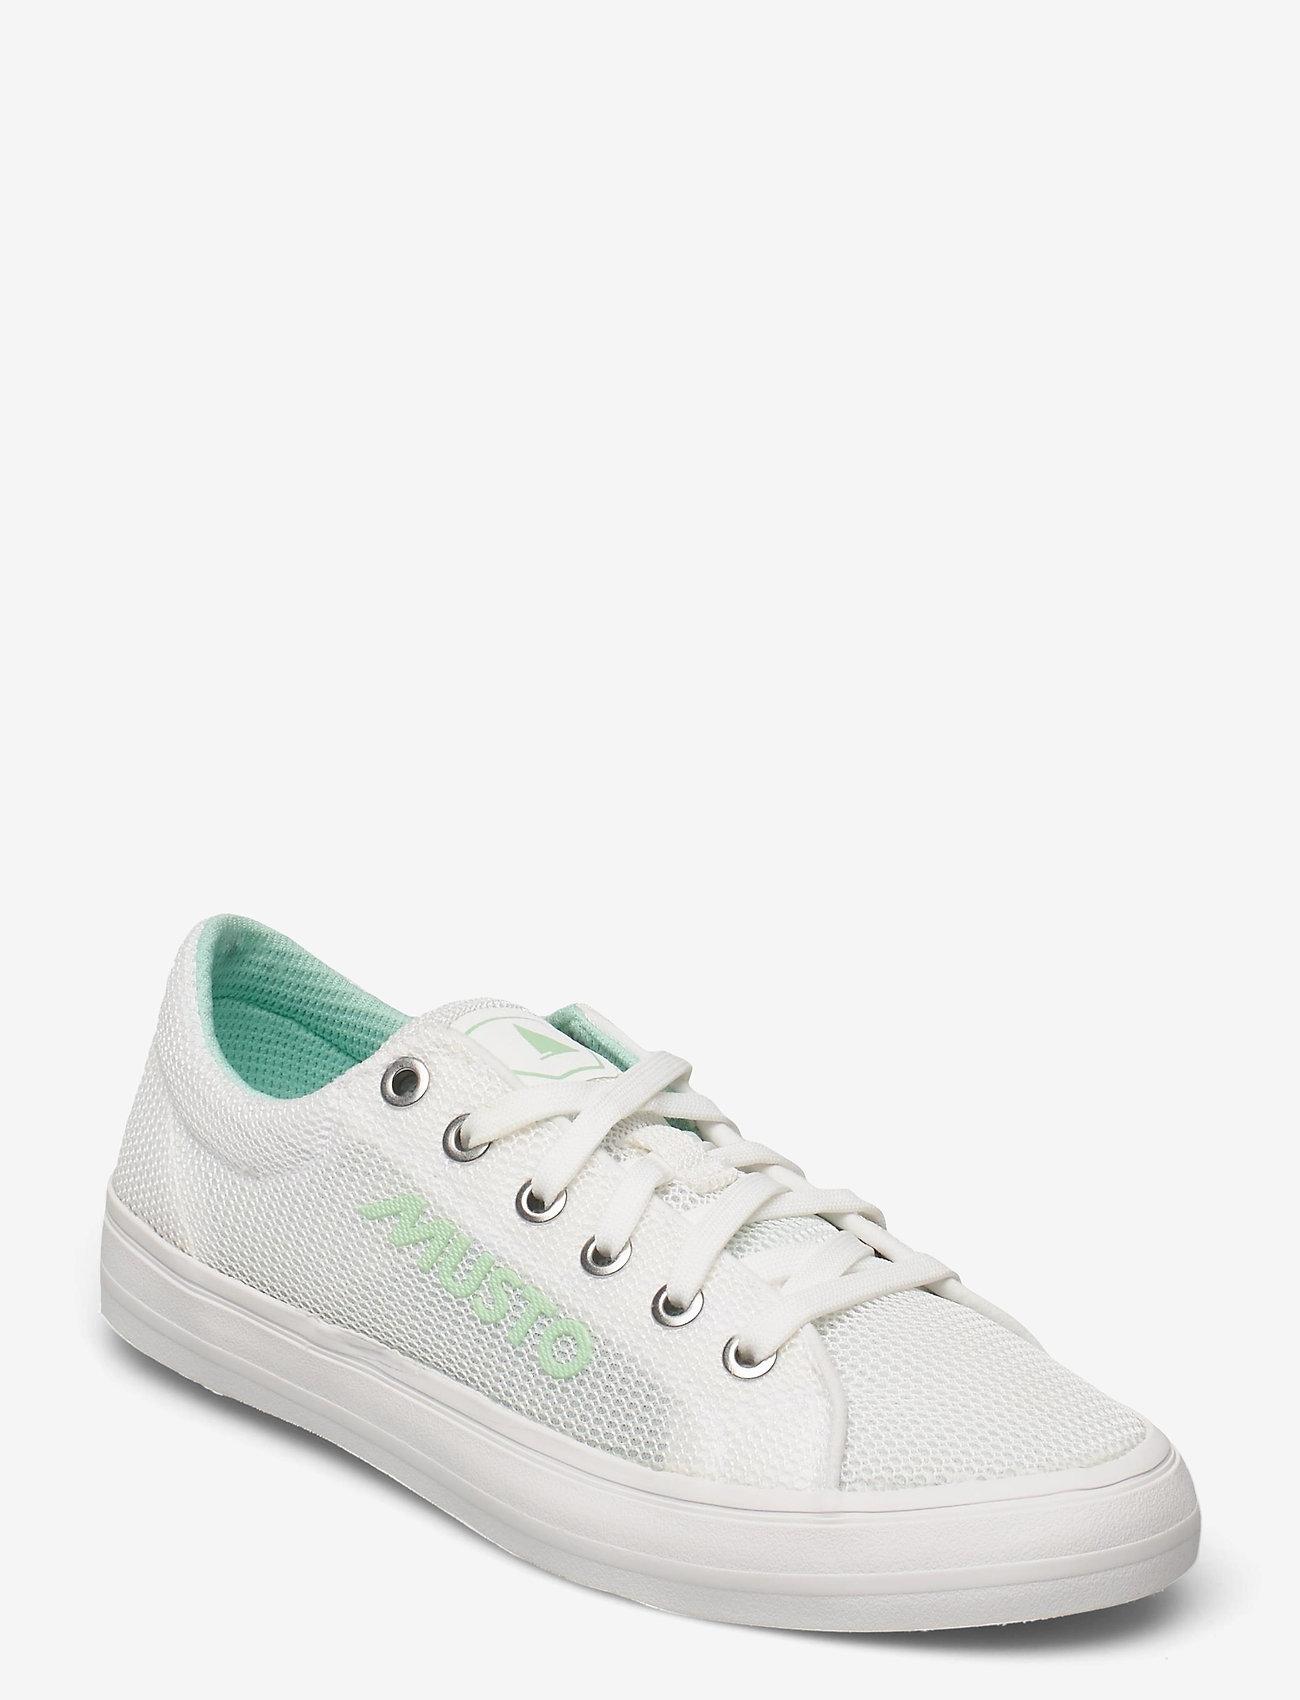 Musto - W NAUTIC ZEPHYR - low top sneakers - white - 0